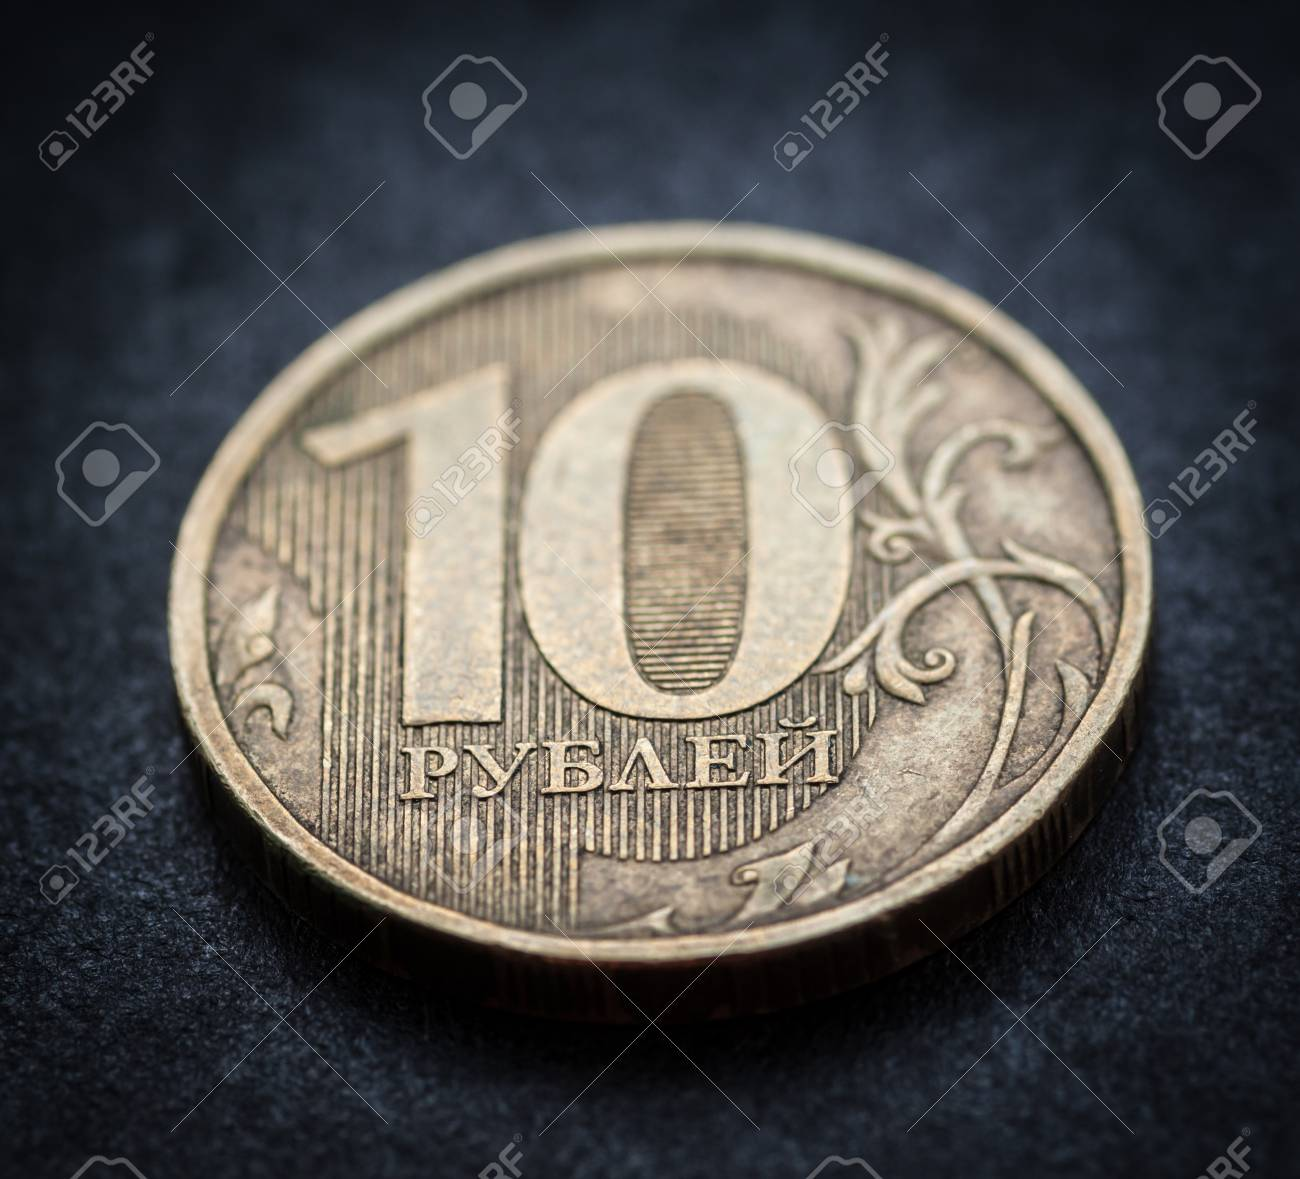 Russian coin - ten rubles Stock Photo - 25647351